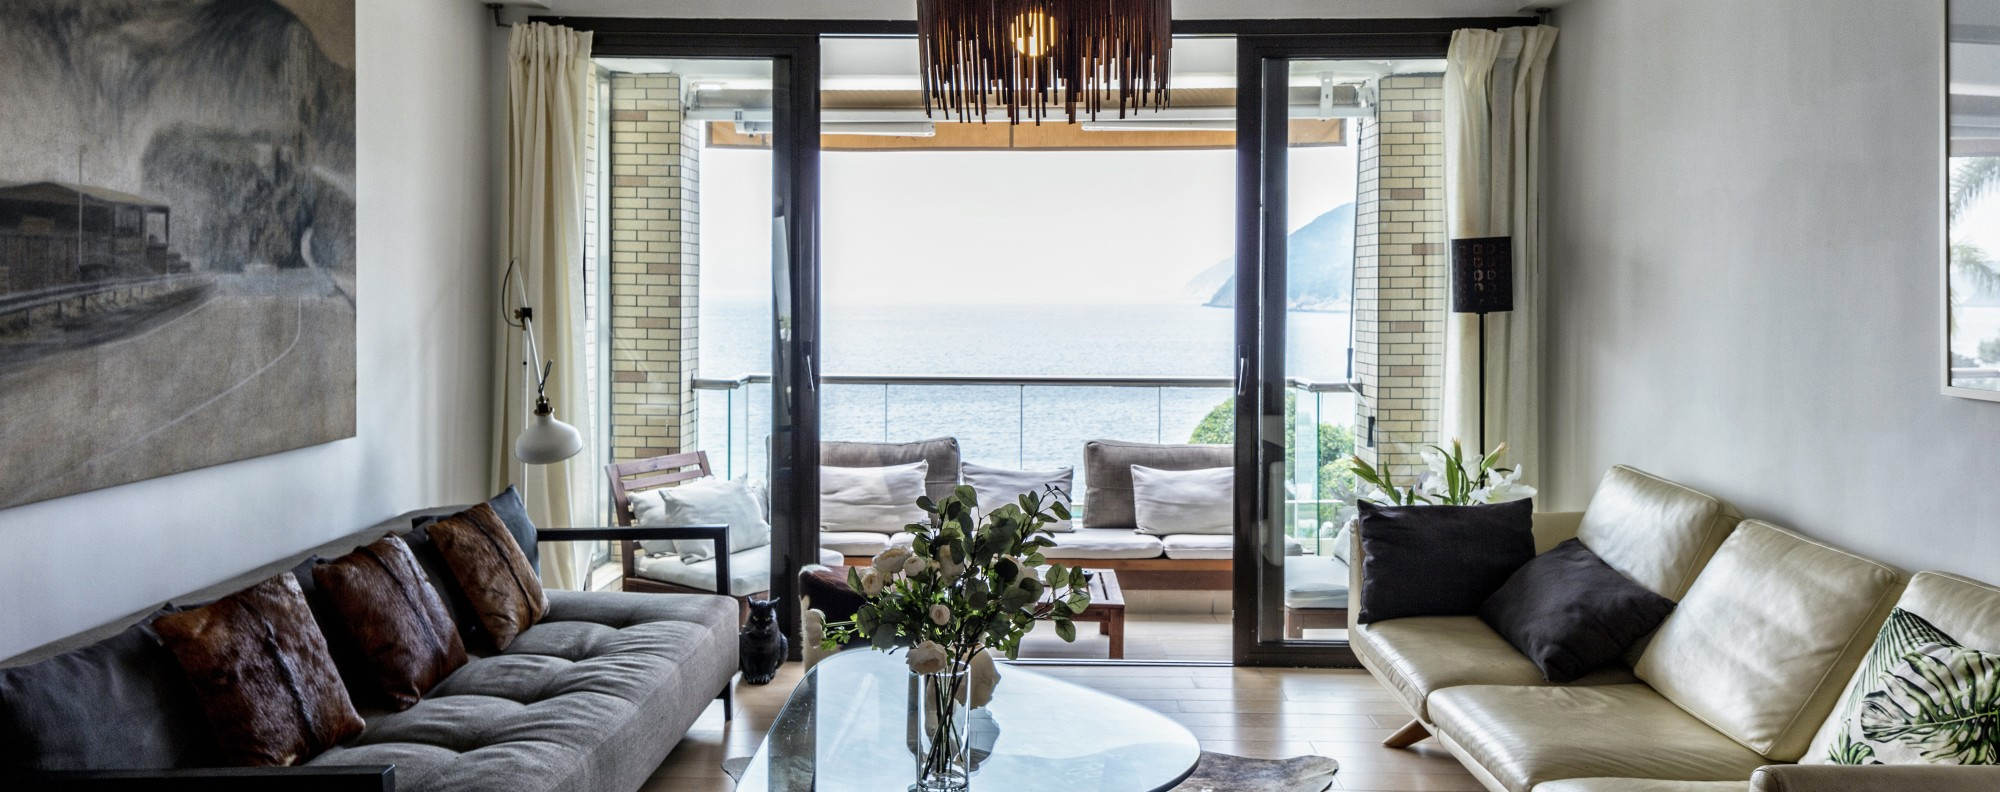 Interior design hong kong home - A French Art Curator S Gallery Like Home In Hong Kong Post Magazine South China Morning Post